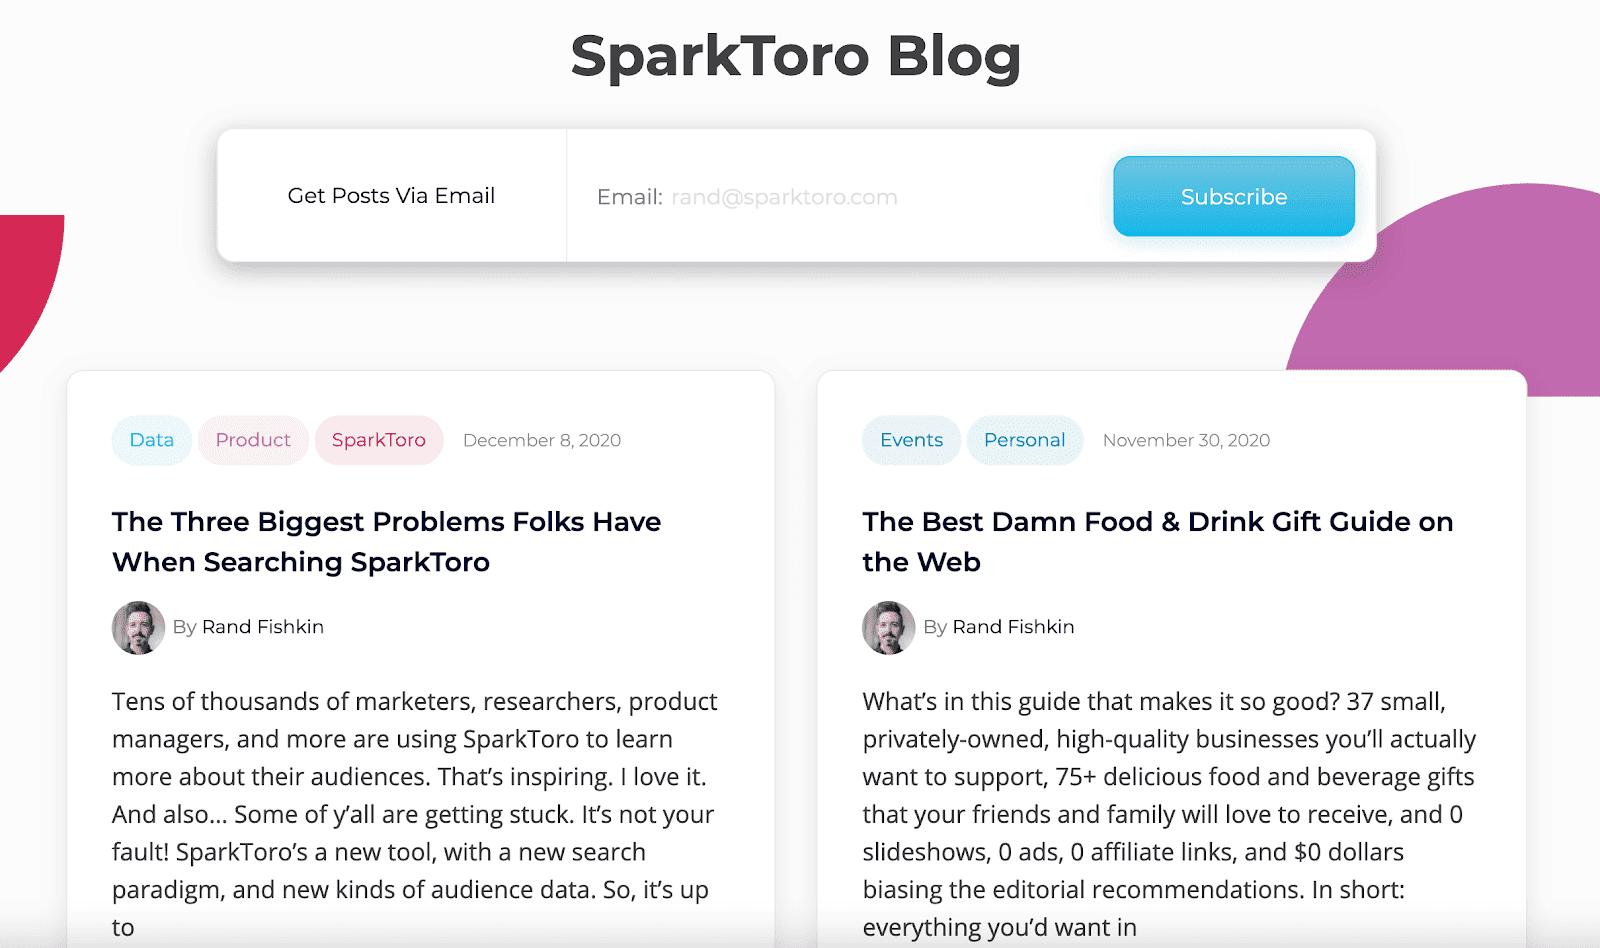 SparkToro blog page